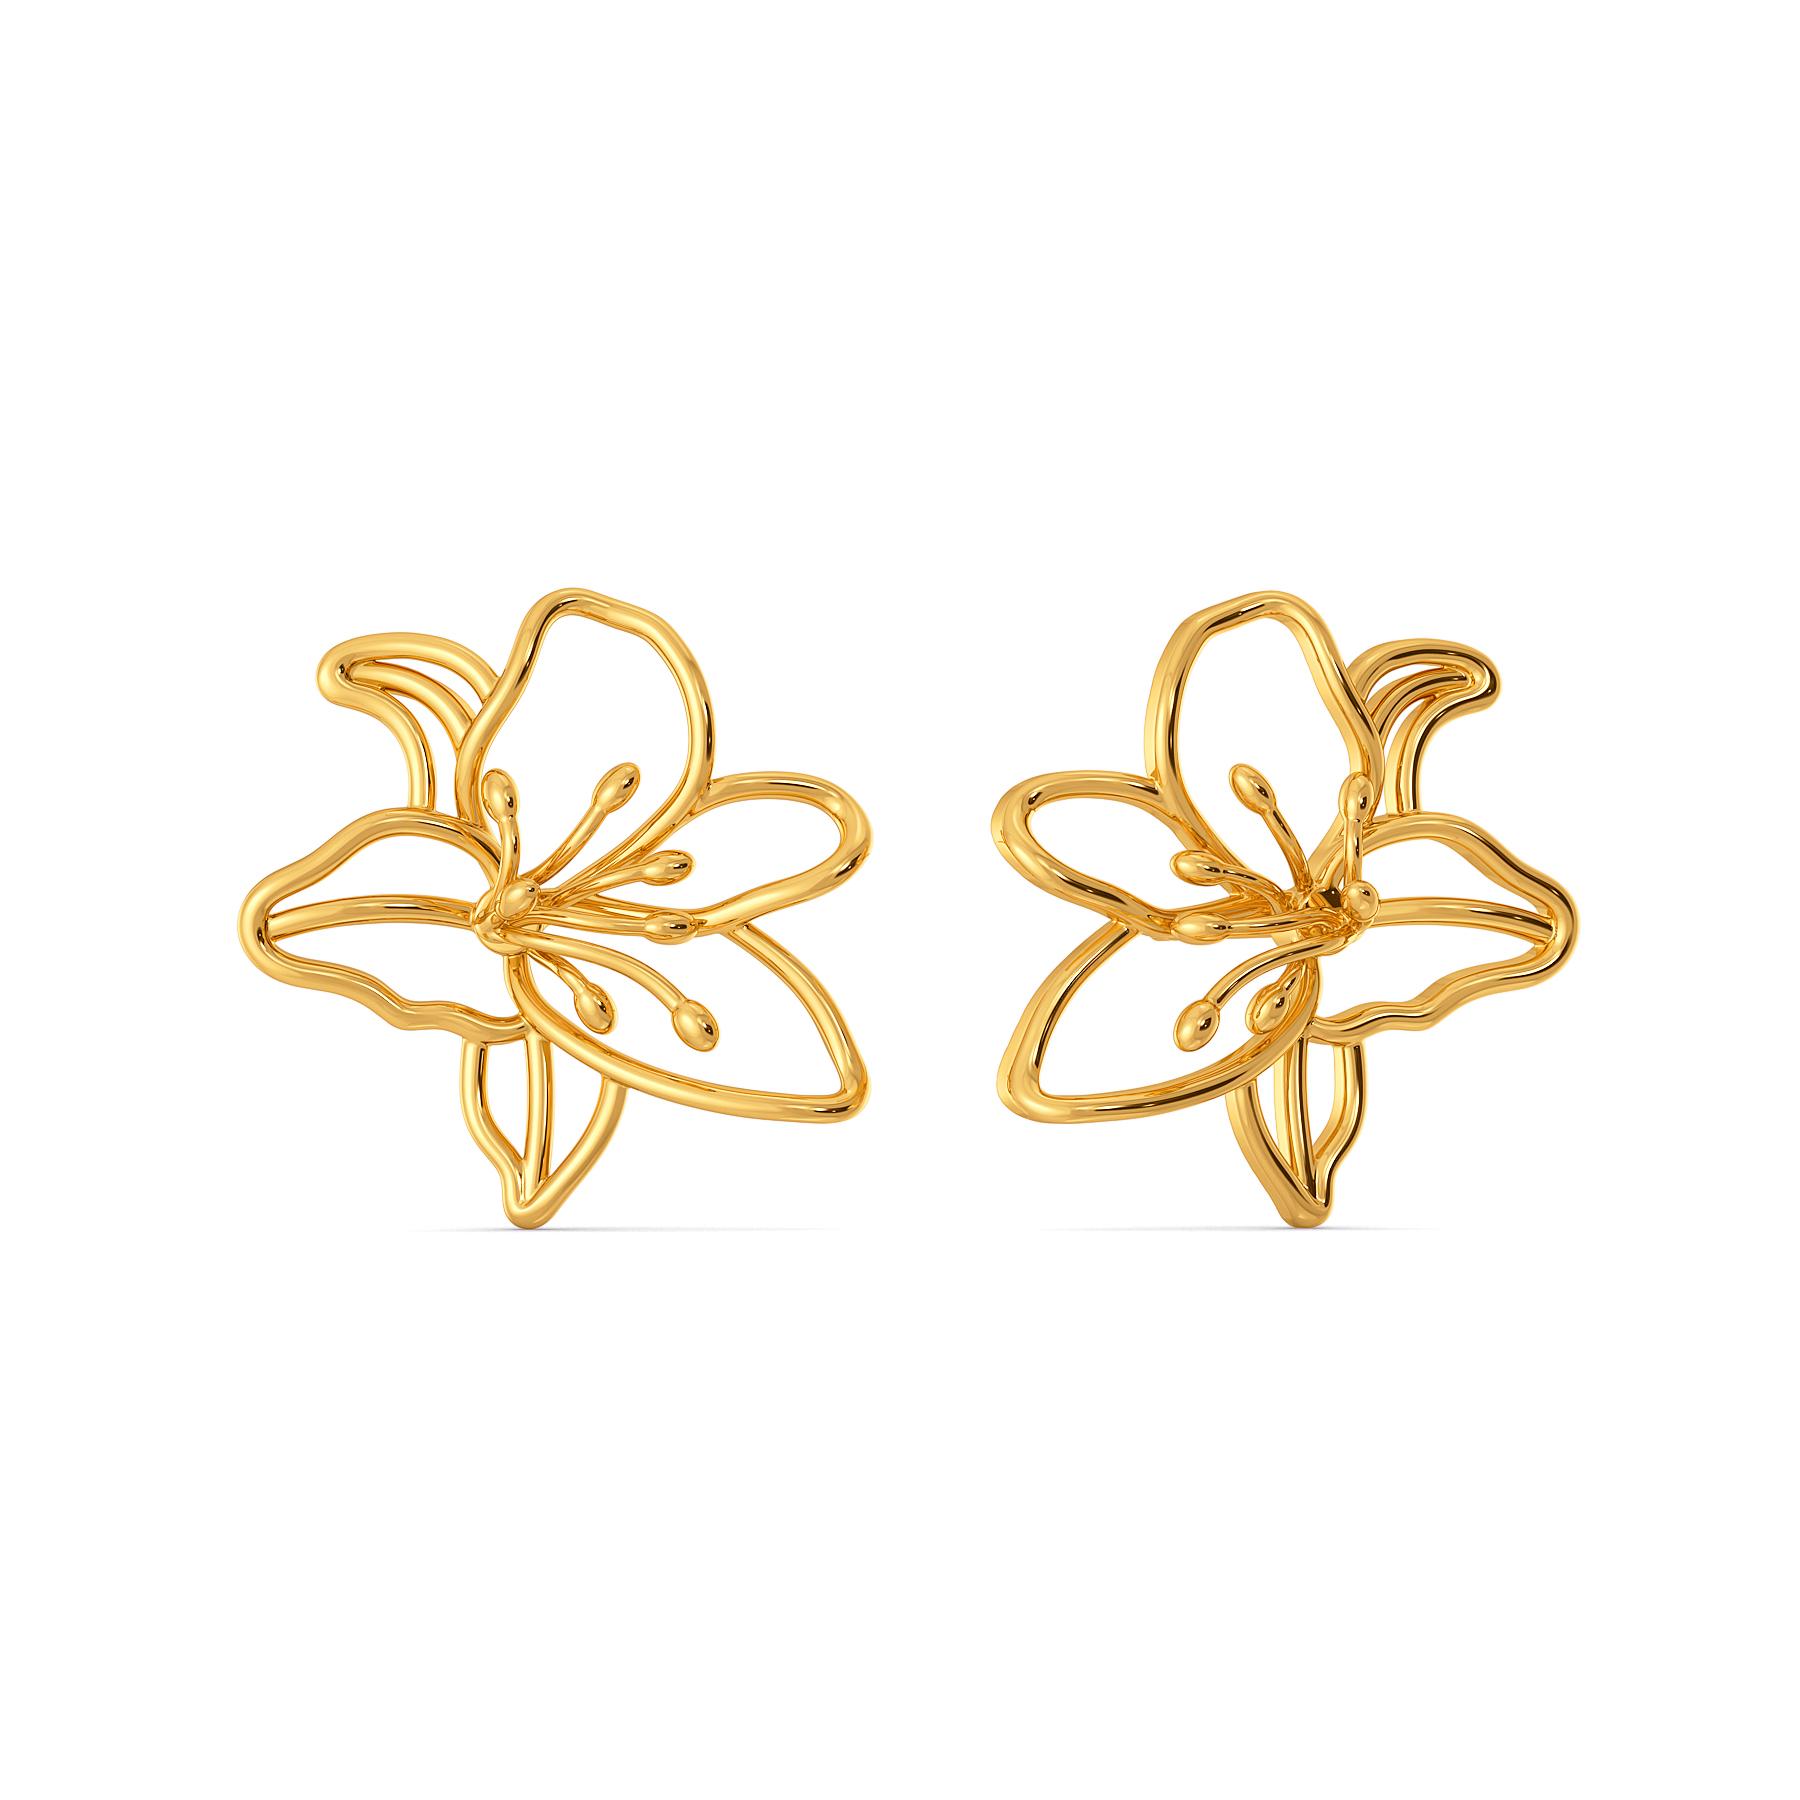 Lily Wonderland Gold Earrings